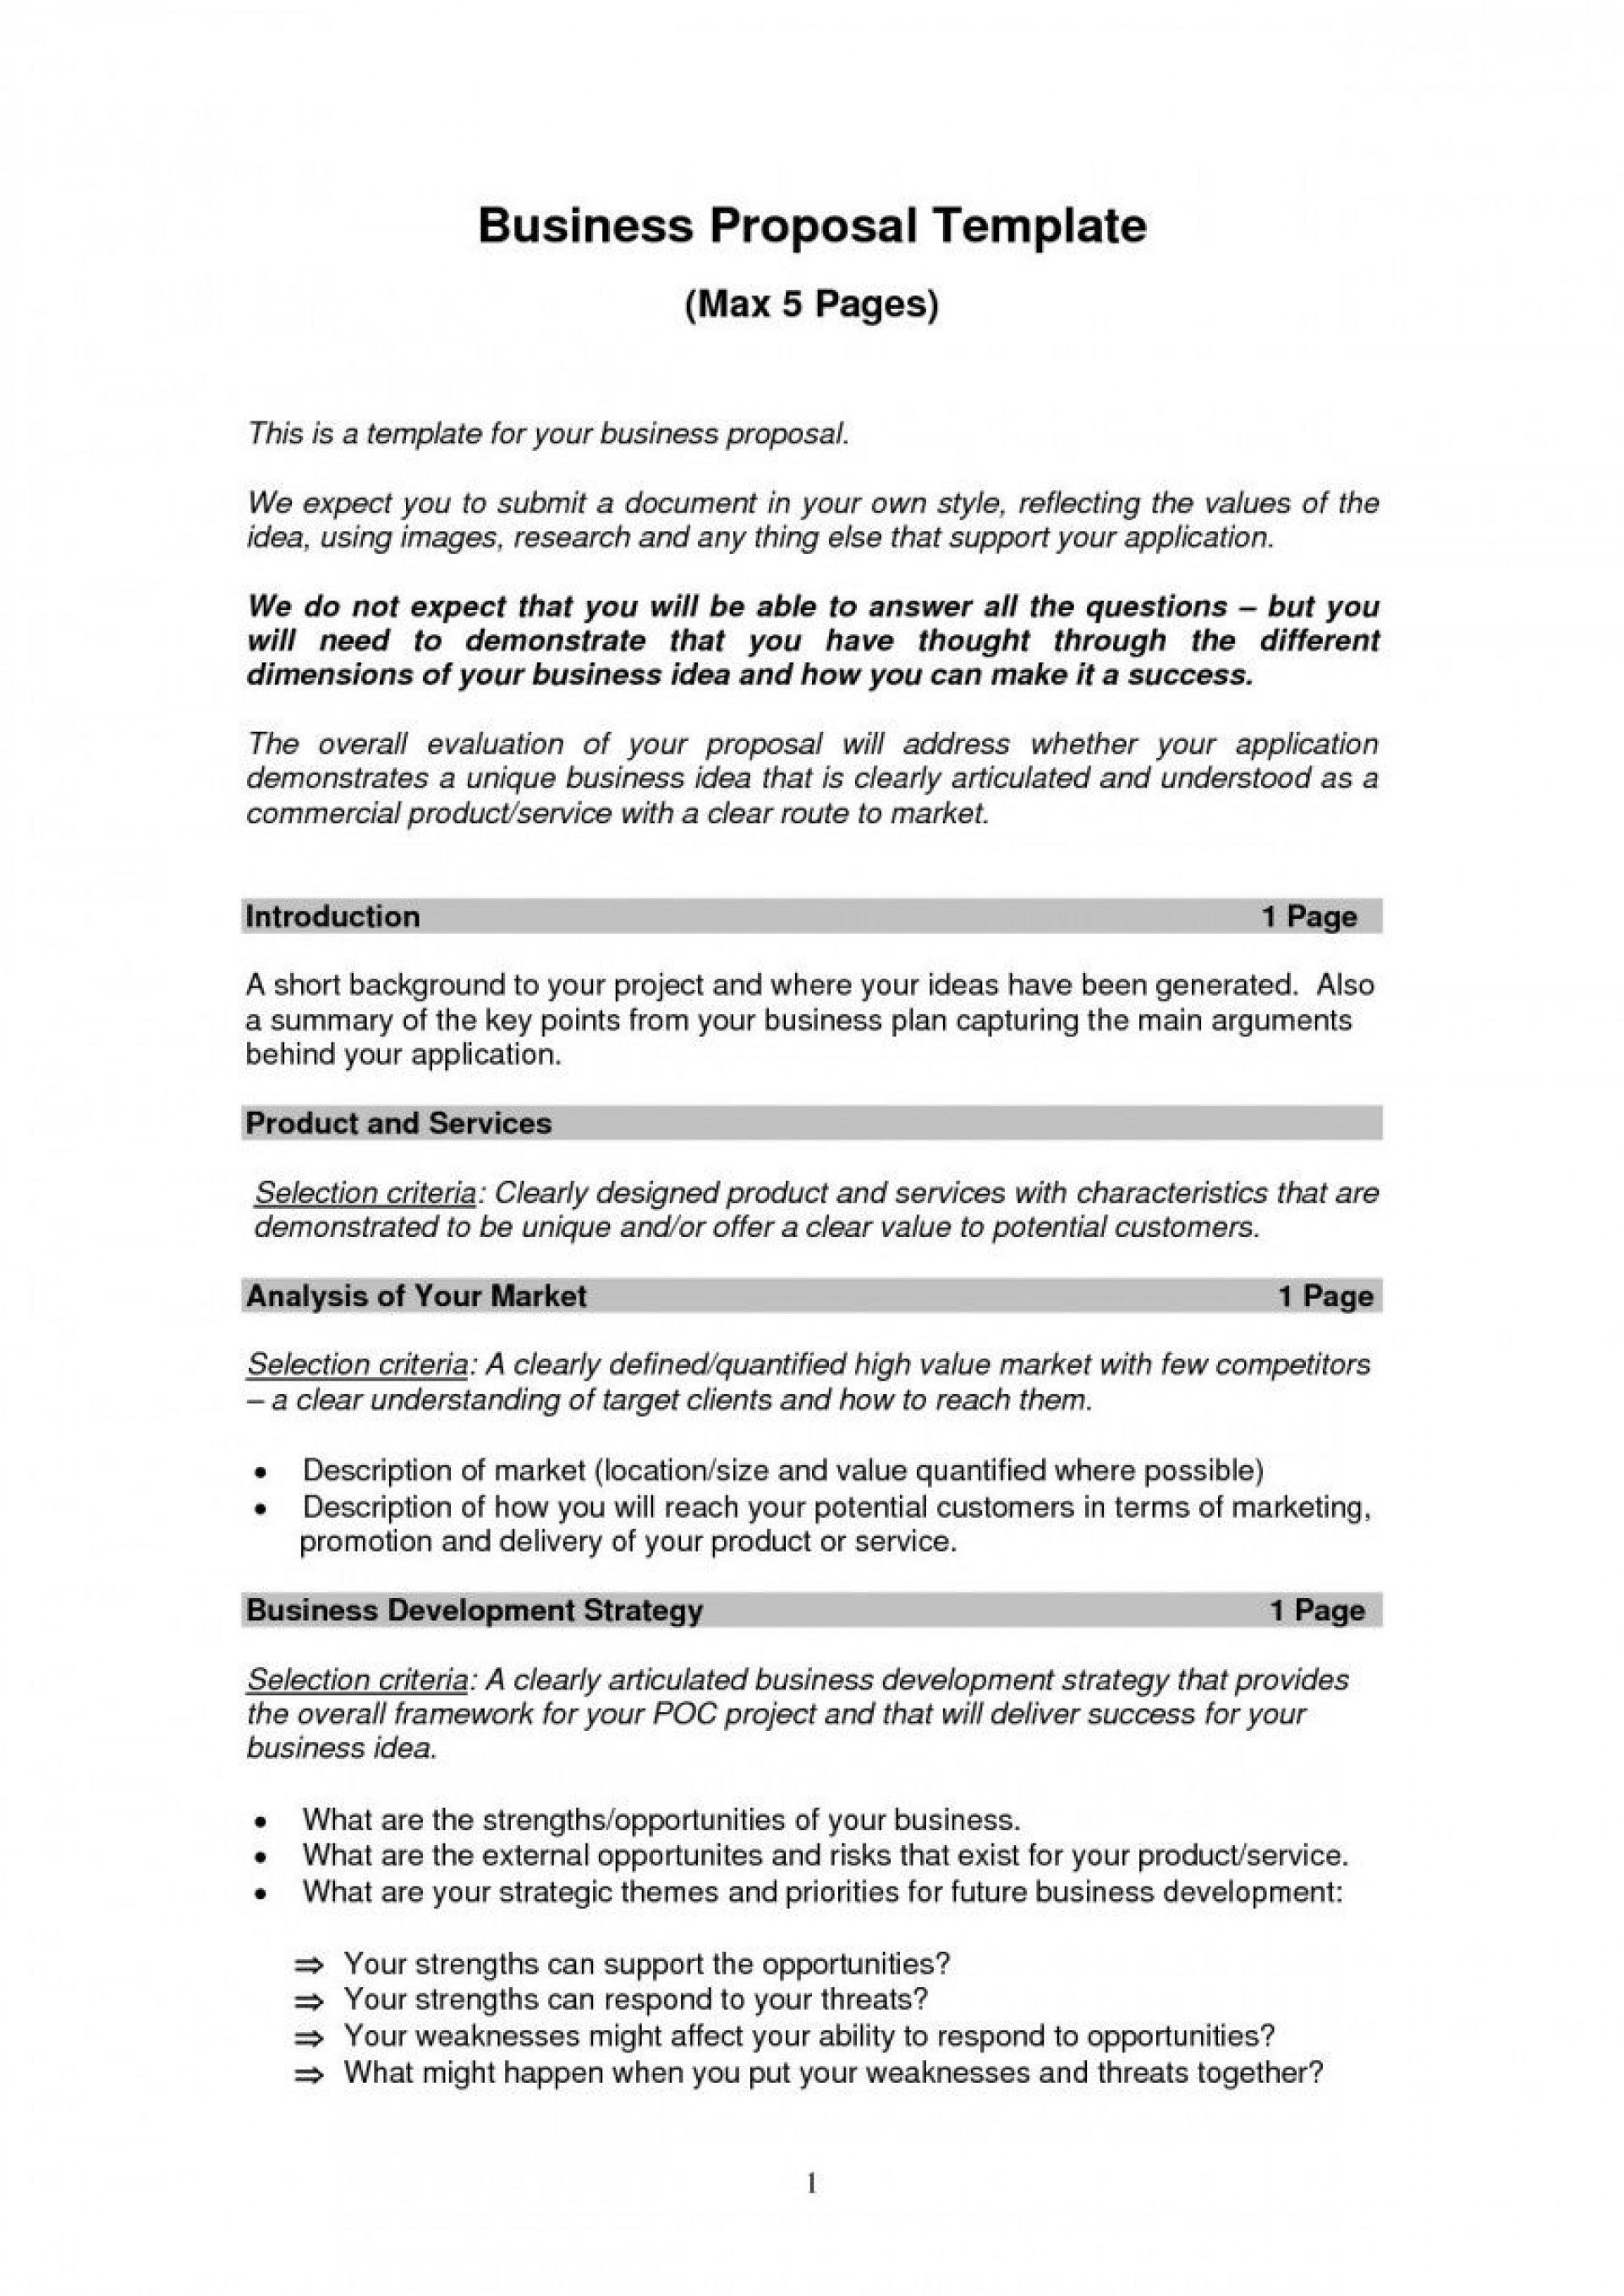 Business Proposal Template Pdf Addictionary